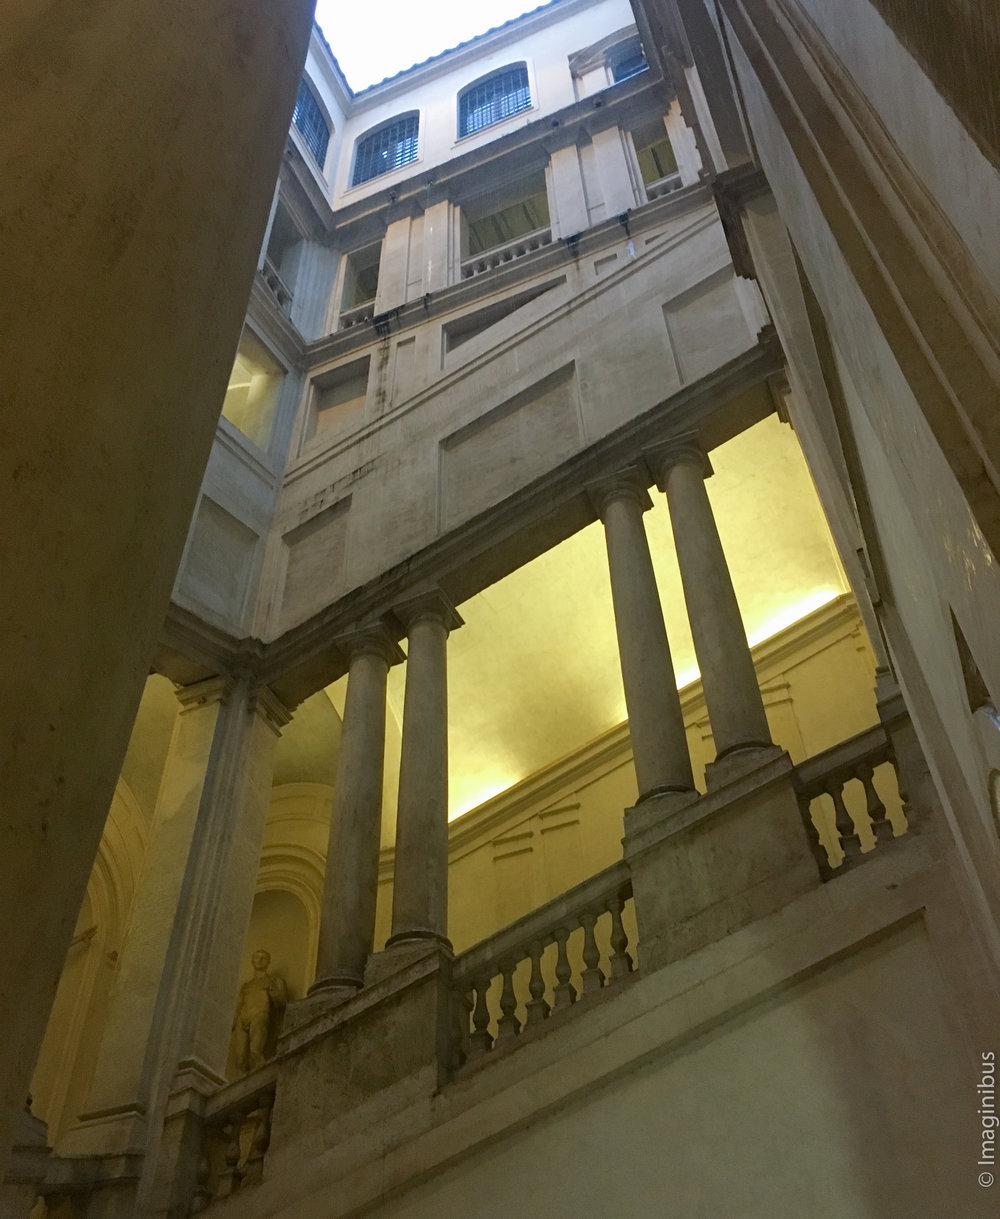 Palazzo Barberini Bernini Square Staircase Rainy